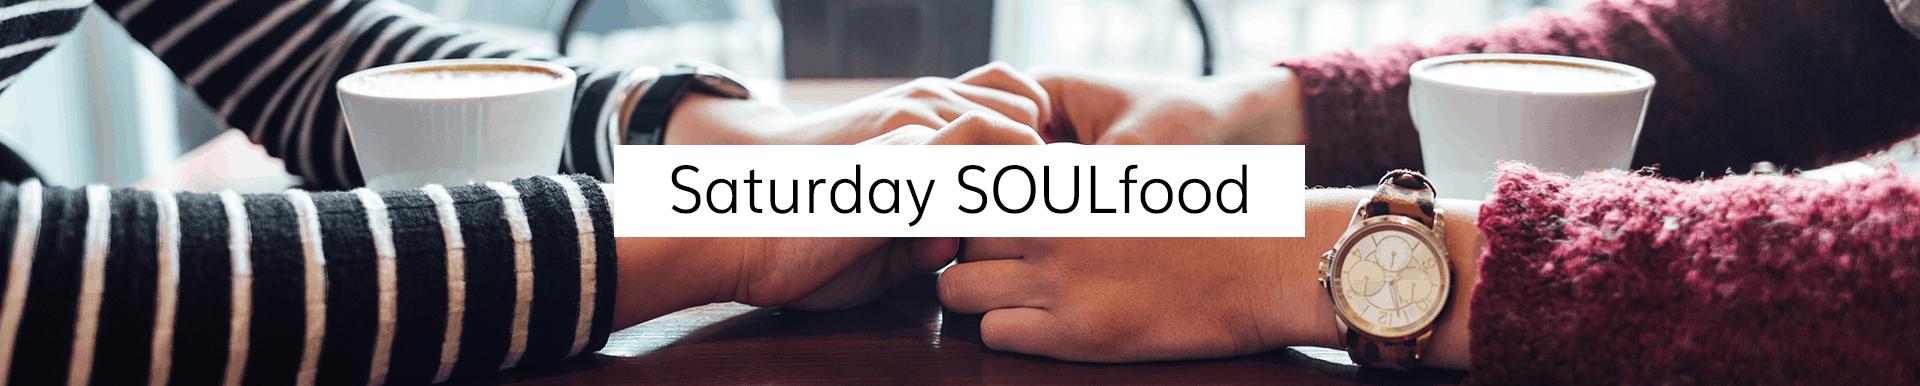 Saturday SoulFood